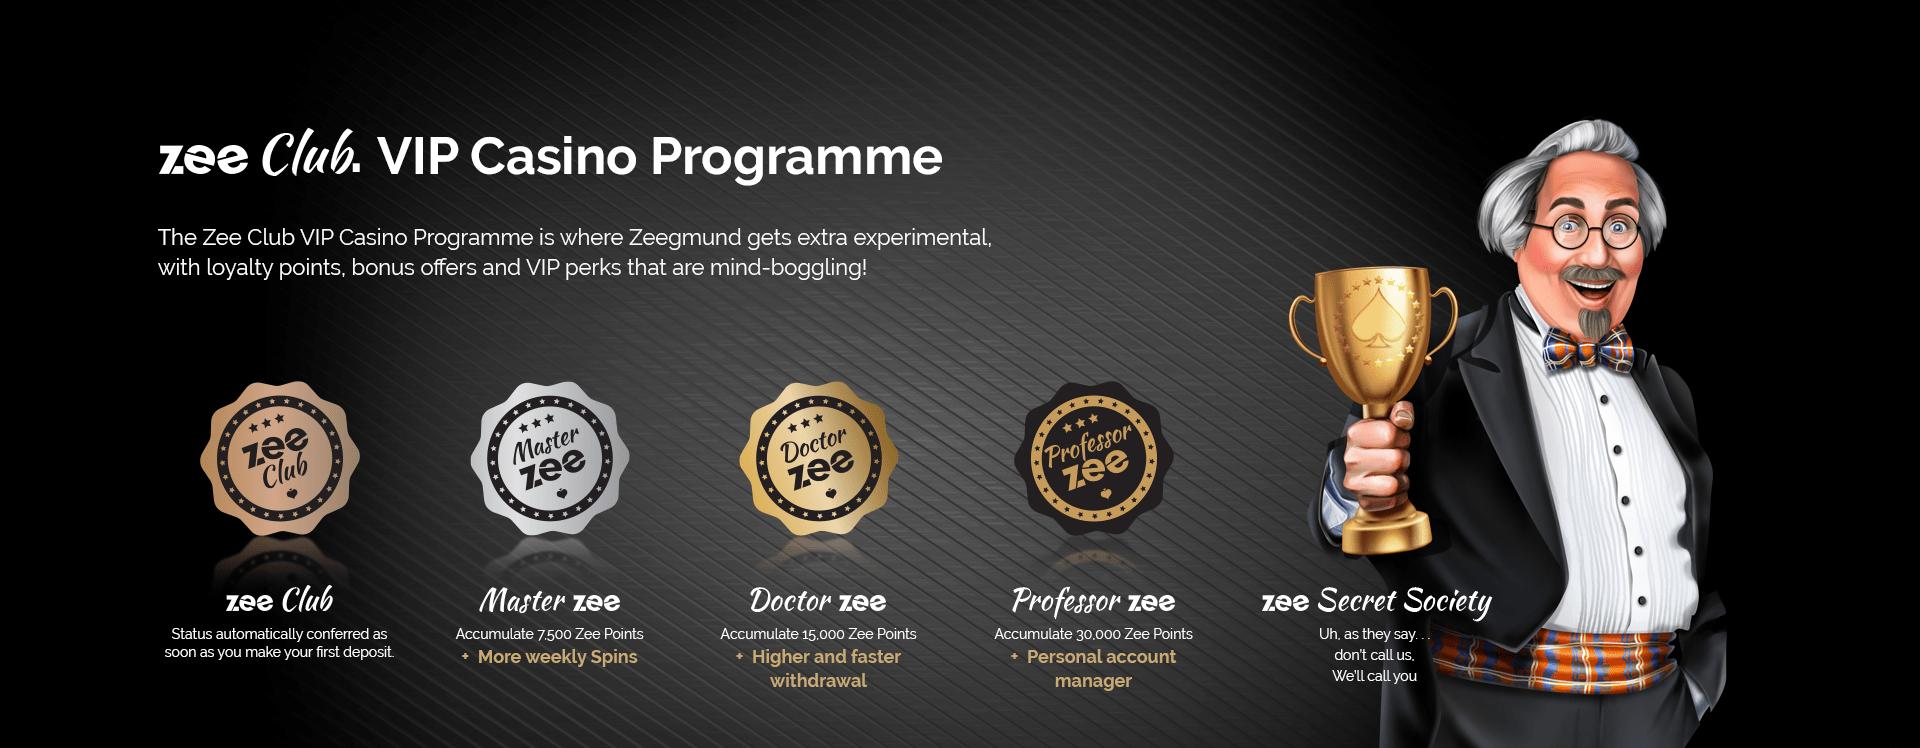 VIP Program Playzee Casino